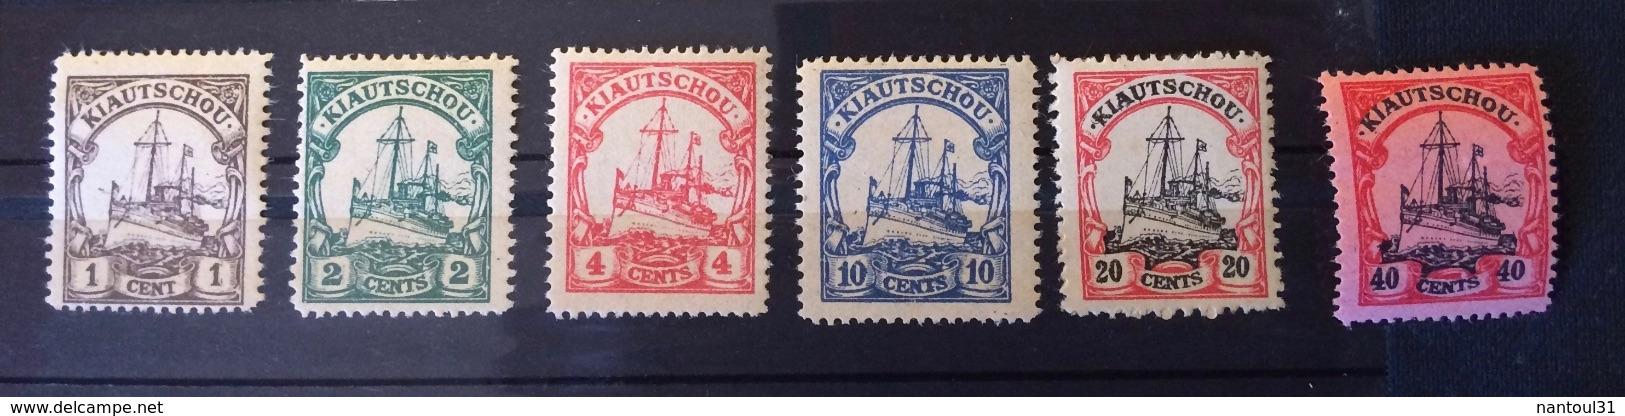 Kiautchou 1905 Colonie Allemande Yvert Et Tellier N°14 à 19 - Colonie: Kiautchou